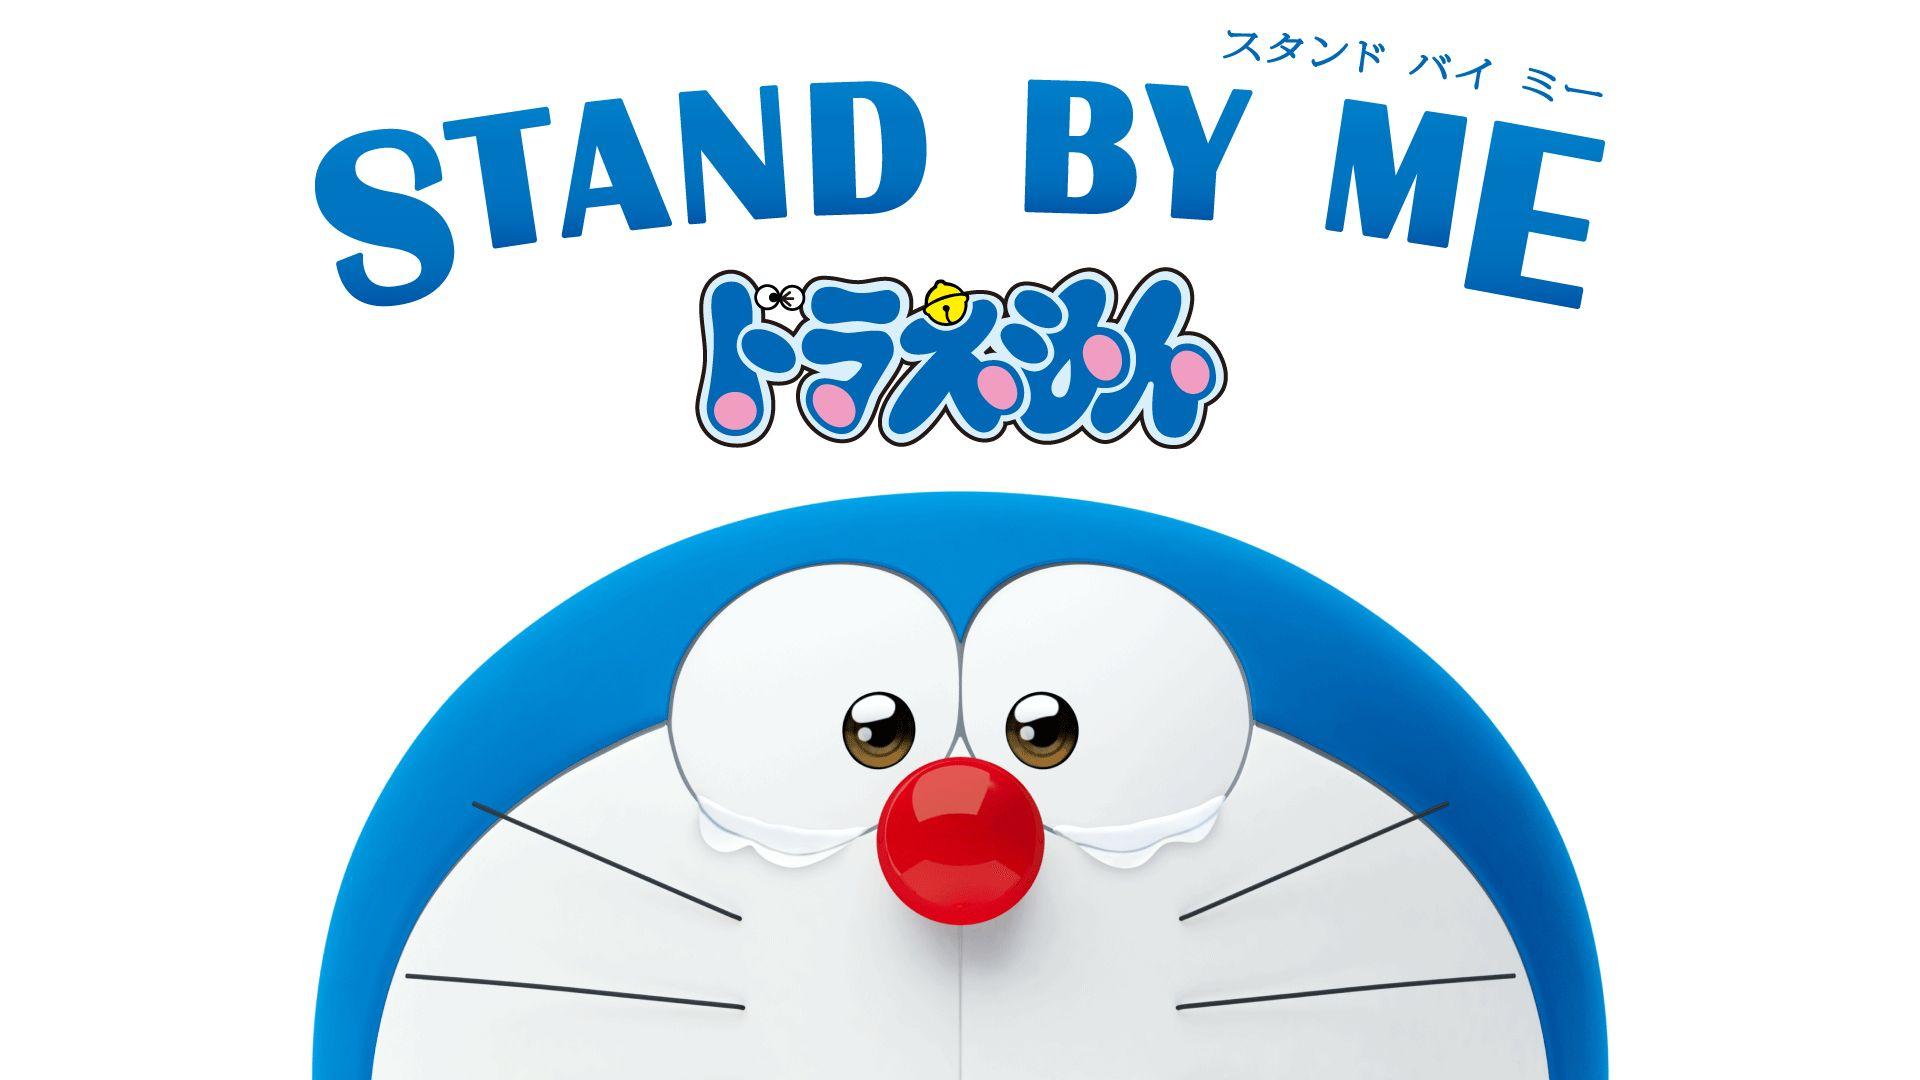 Doraemon Wallpaper For Iphone Hd Wallpapers Doraemon Wallpapers